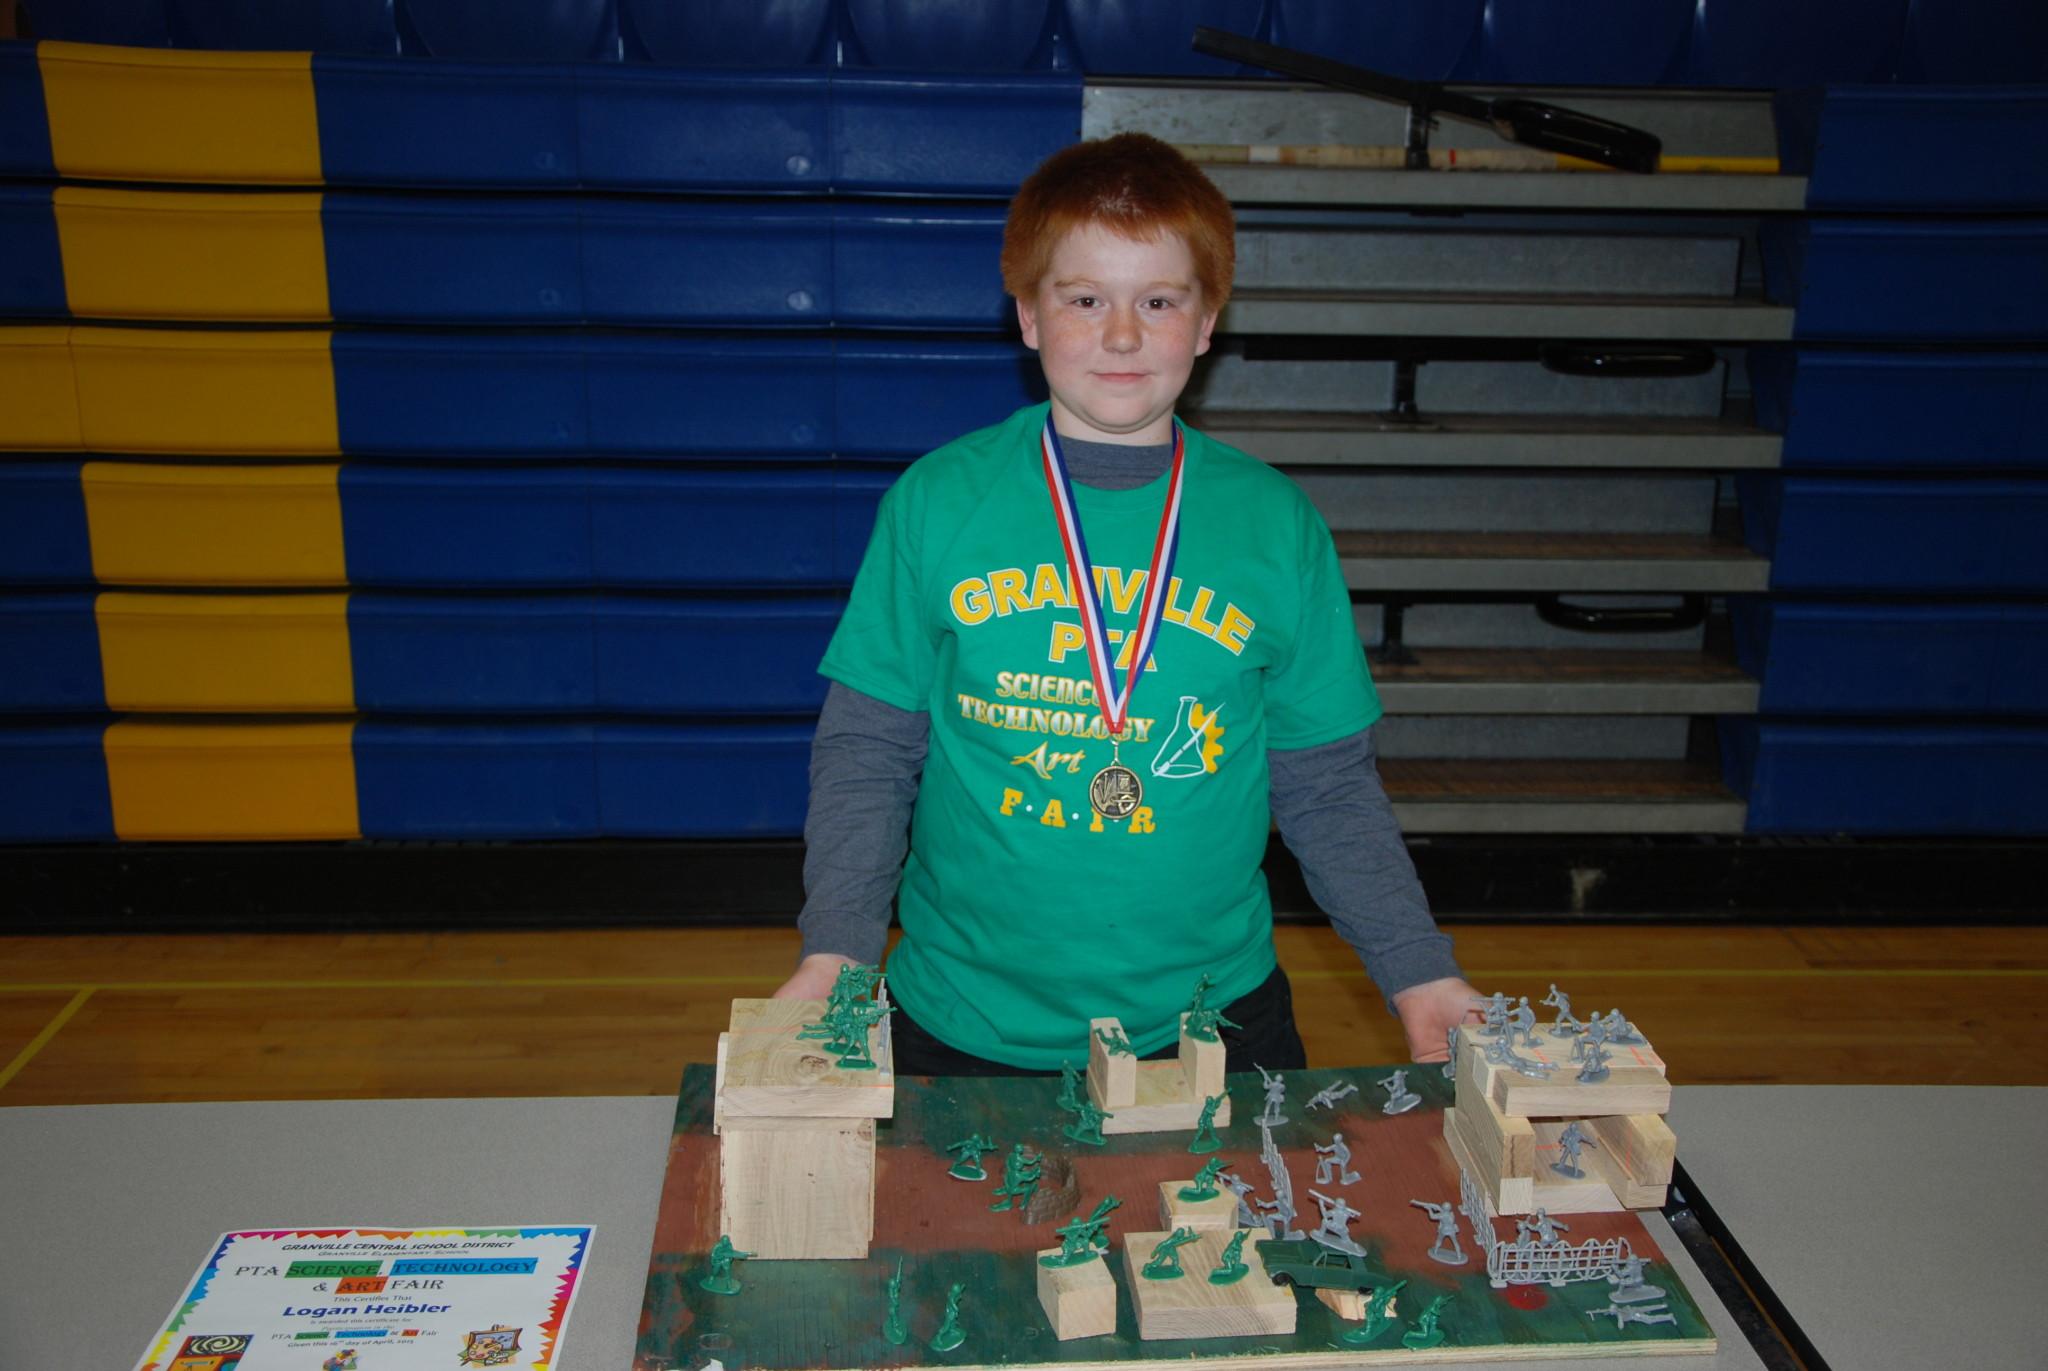 Granville Science Fair a hit